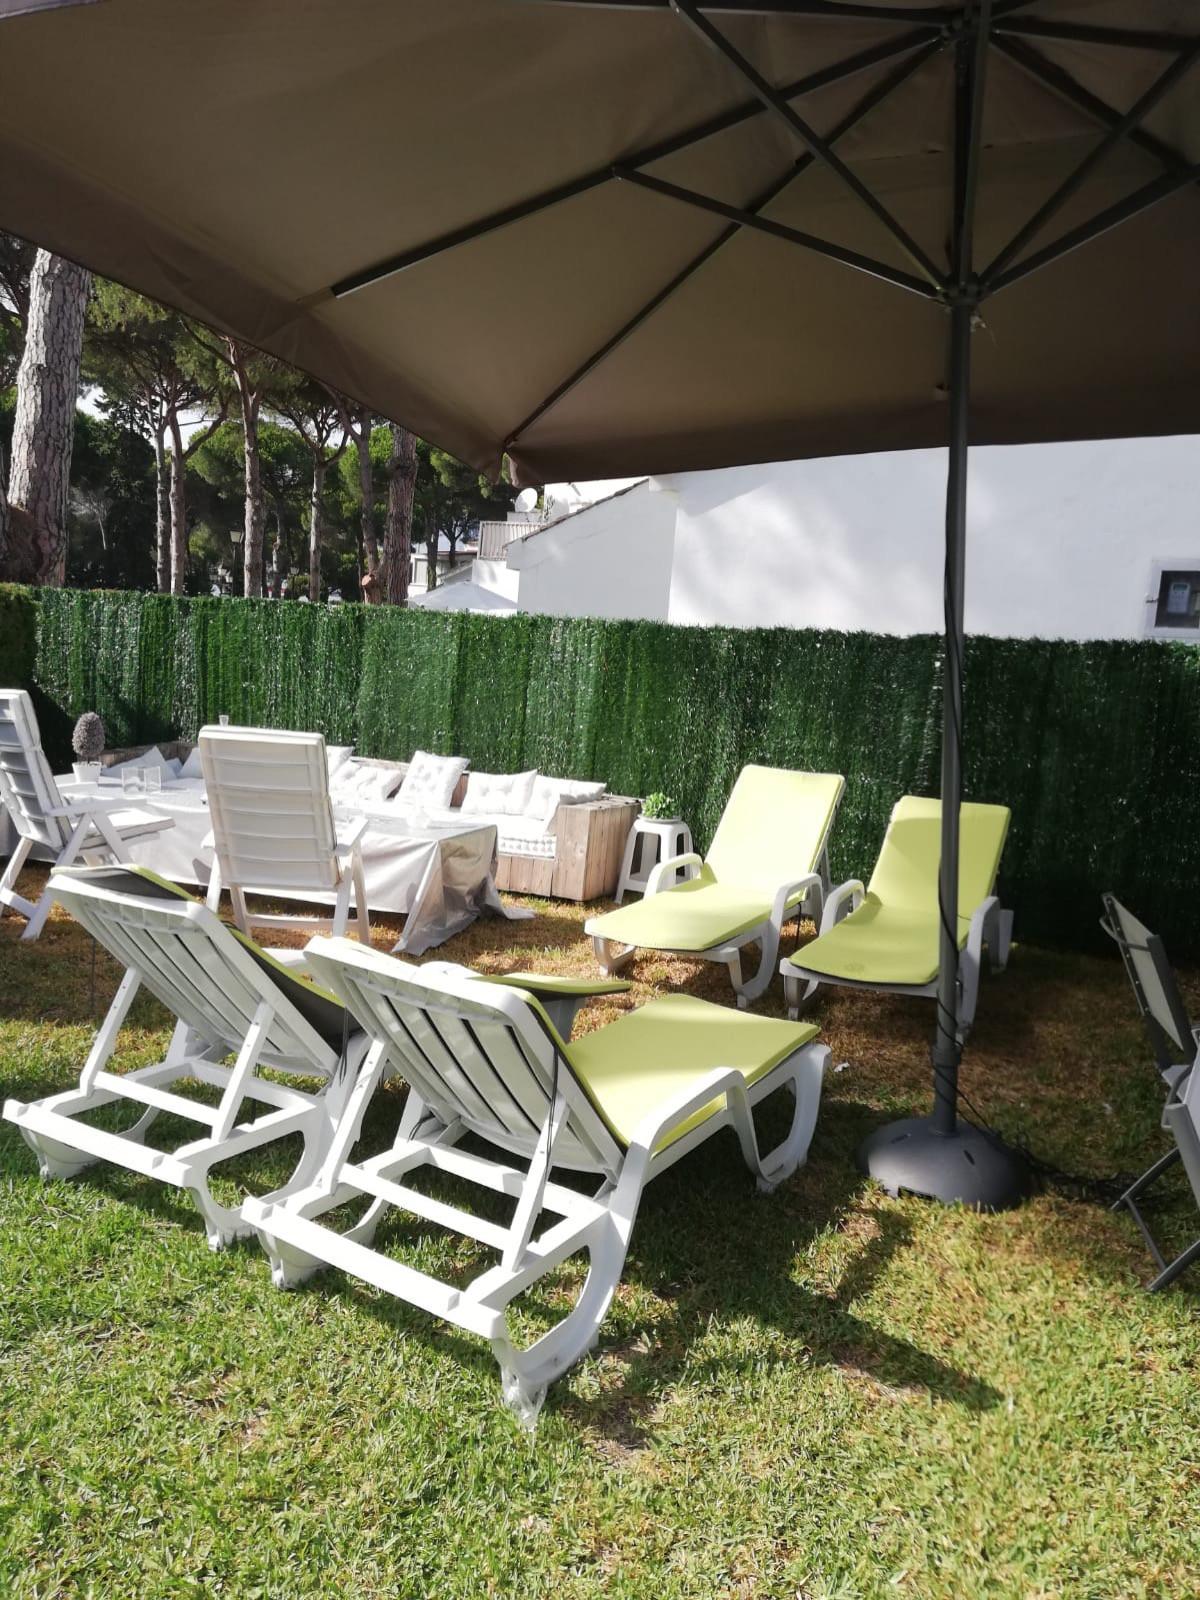 Townhouse Terraced for sale in Benamara, Costa del Sol